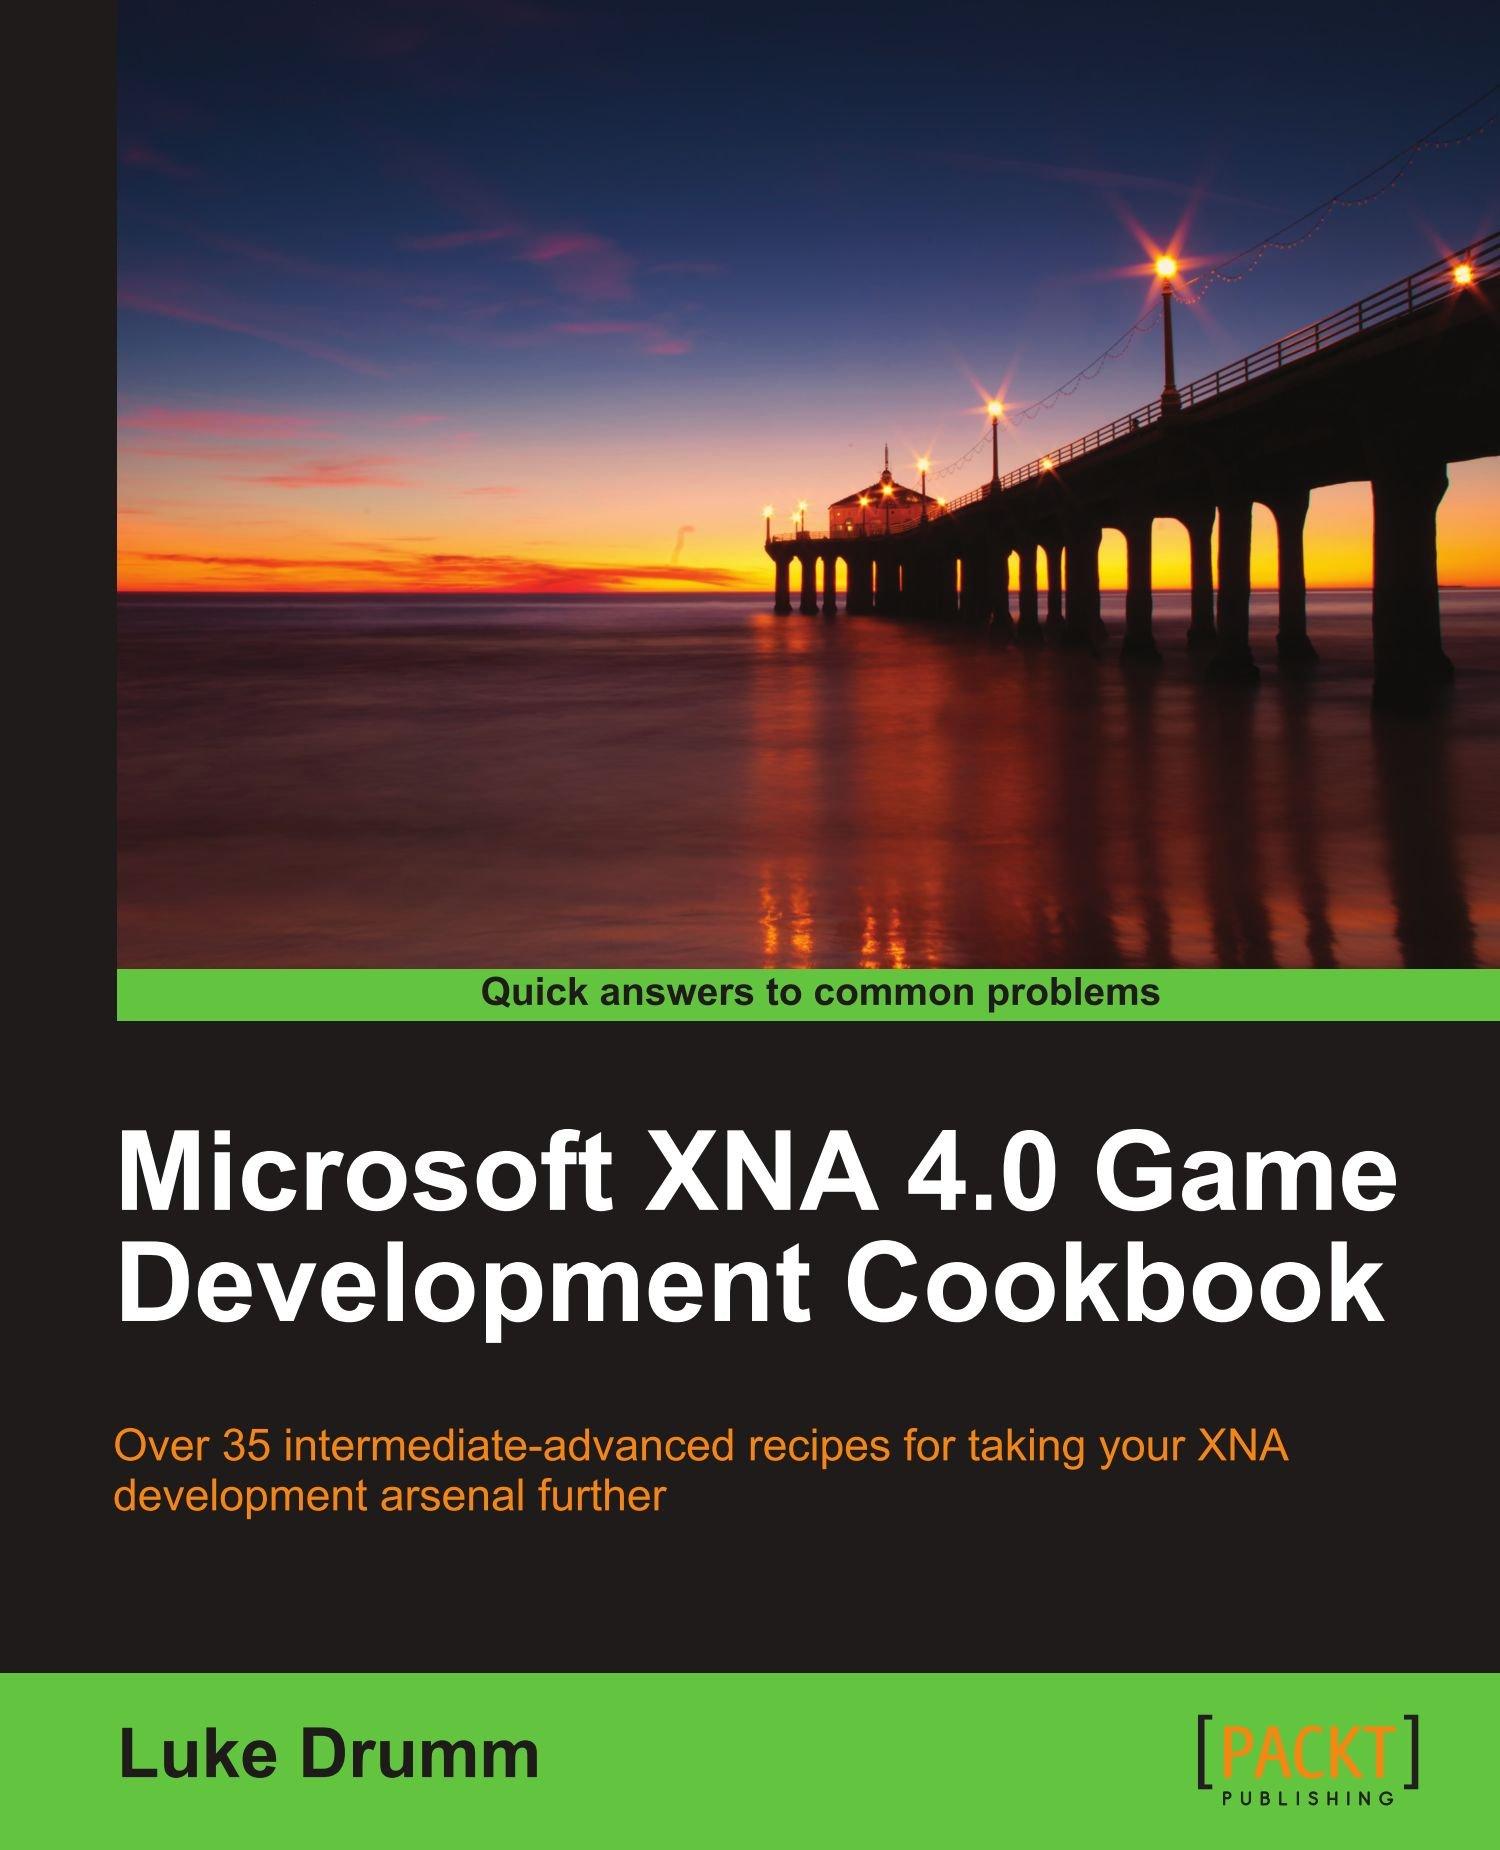 Microsoft xna 4 0 game development cookbook luke drumm 9781849691987 amazon com books